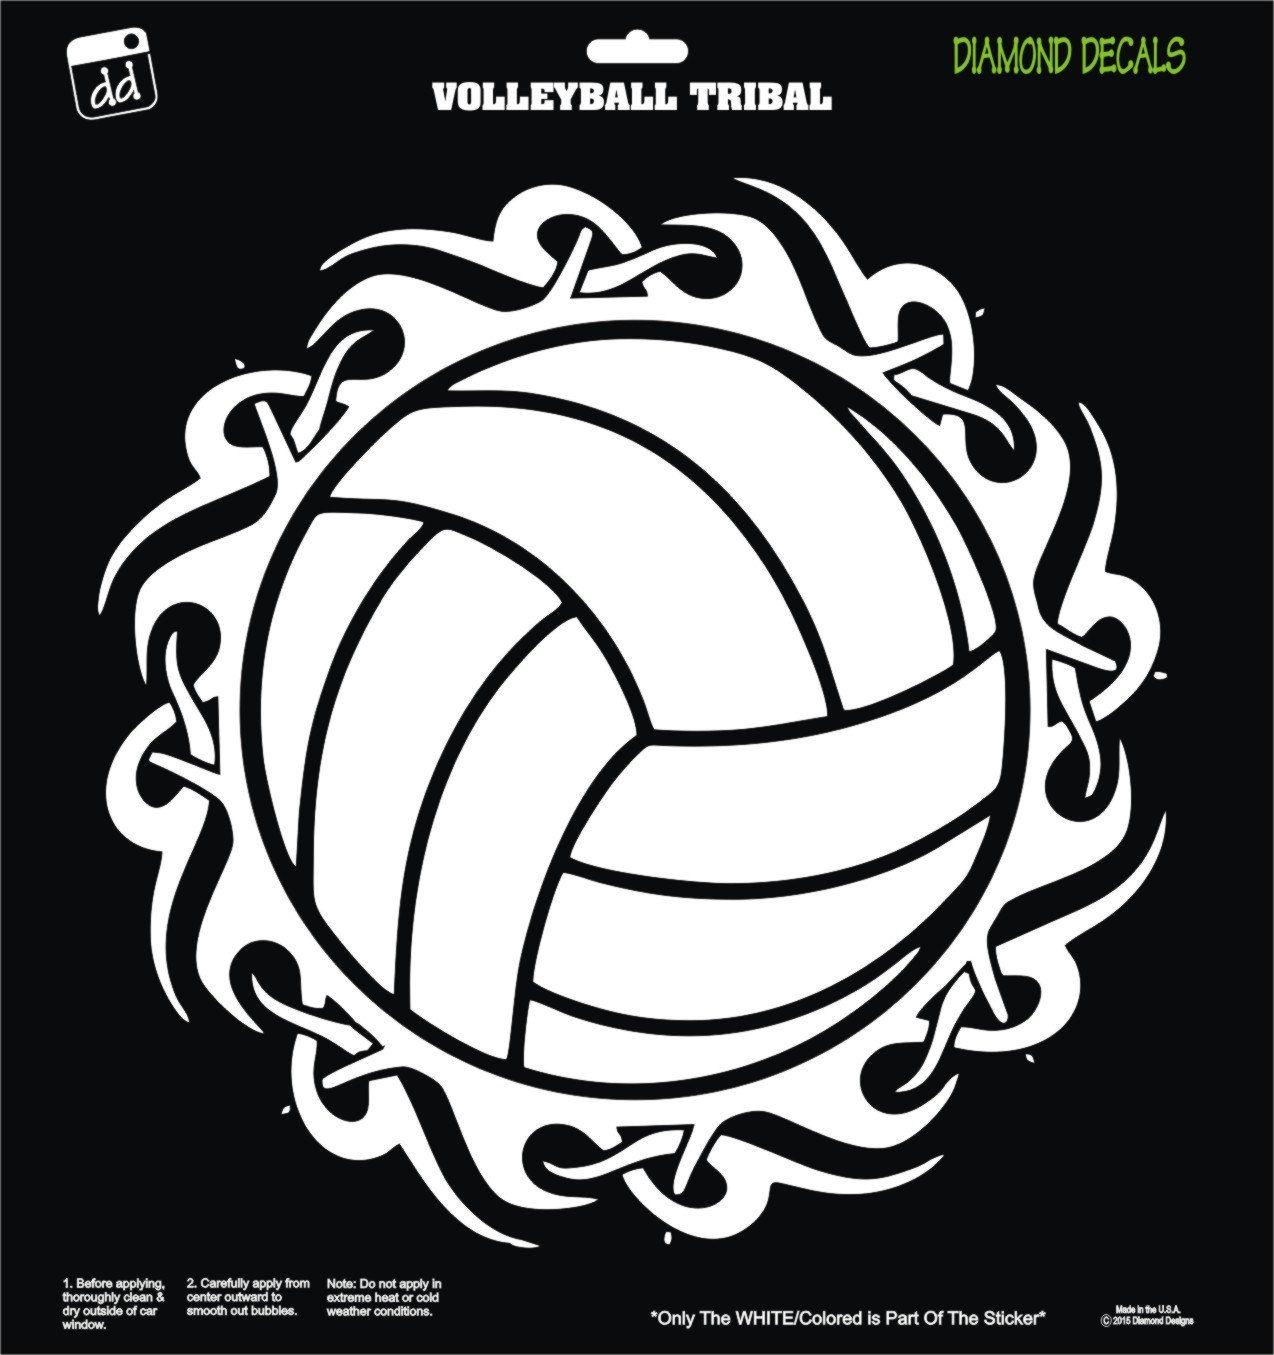 Volleyball Tribal Womens College Dig Ncaa Decal Vinyl Sticker Car Truck Laptop Suv Window Diamond Decals Vinyl Sticker Tribal